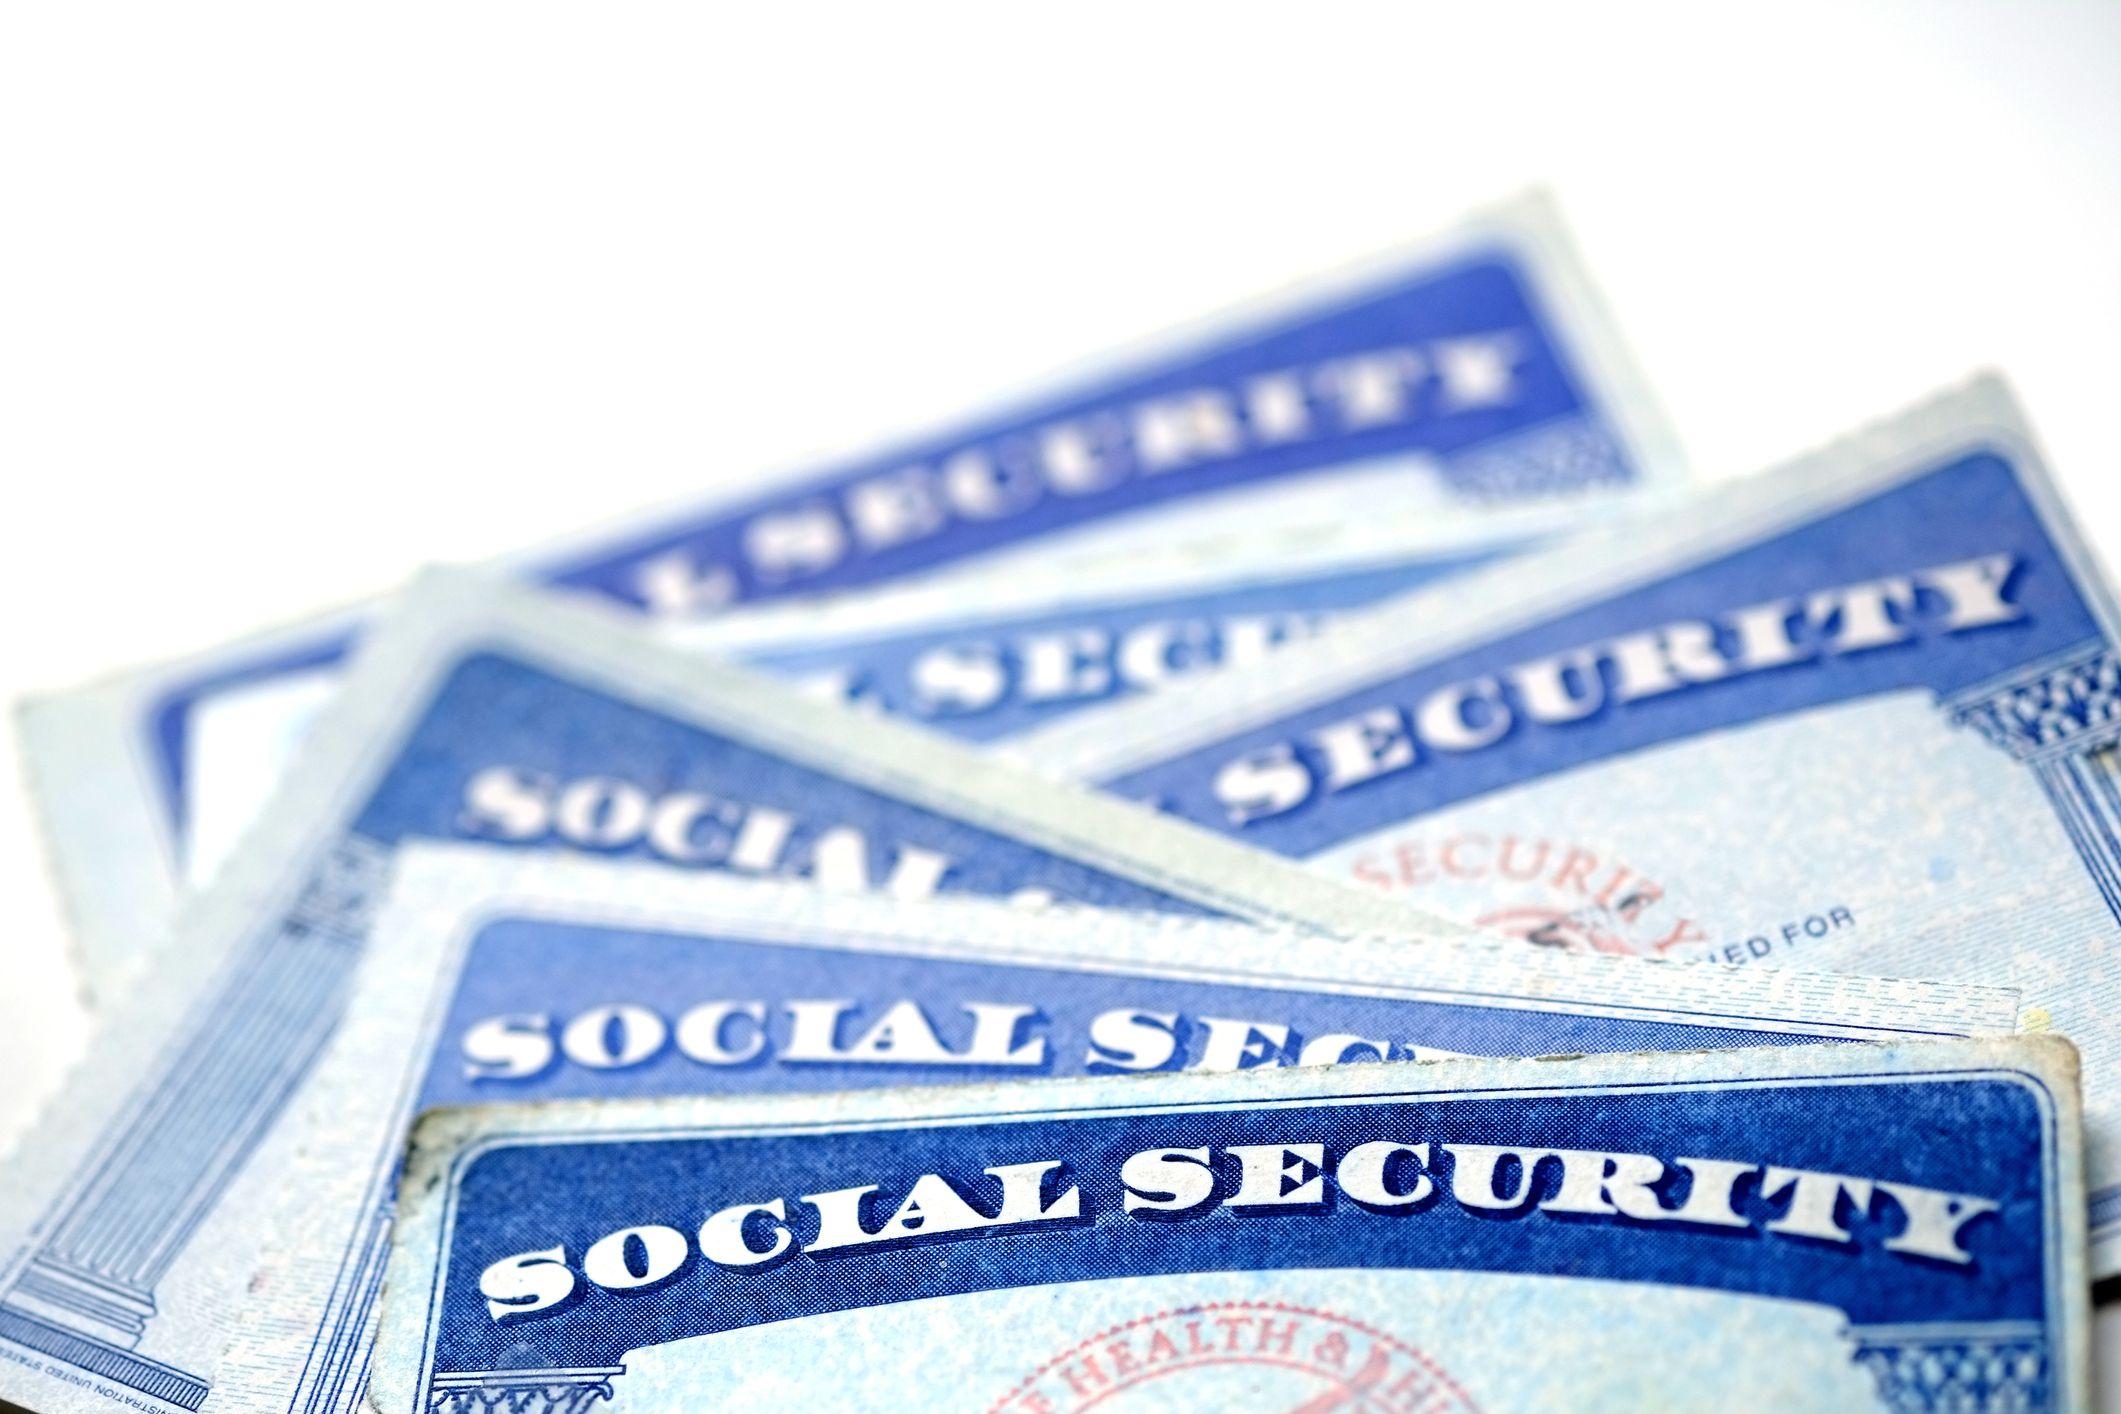 security insurance avoid social income payroll socialsecurity trap franklin tax president pay